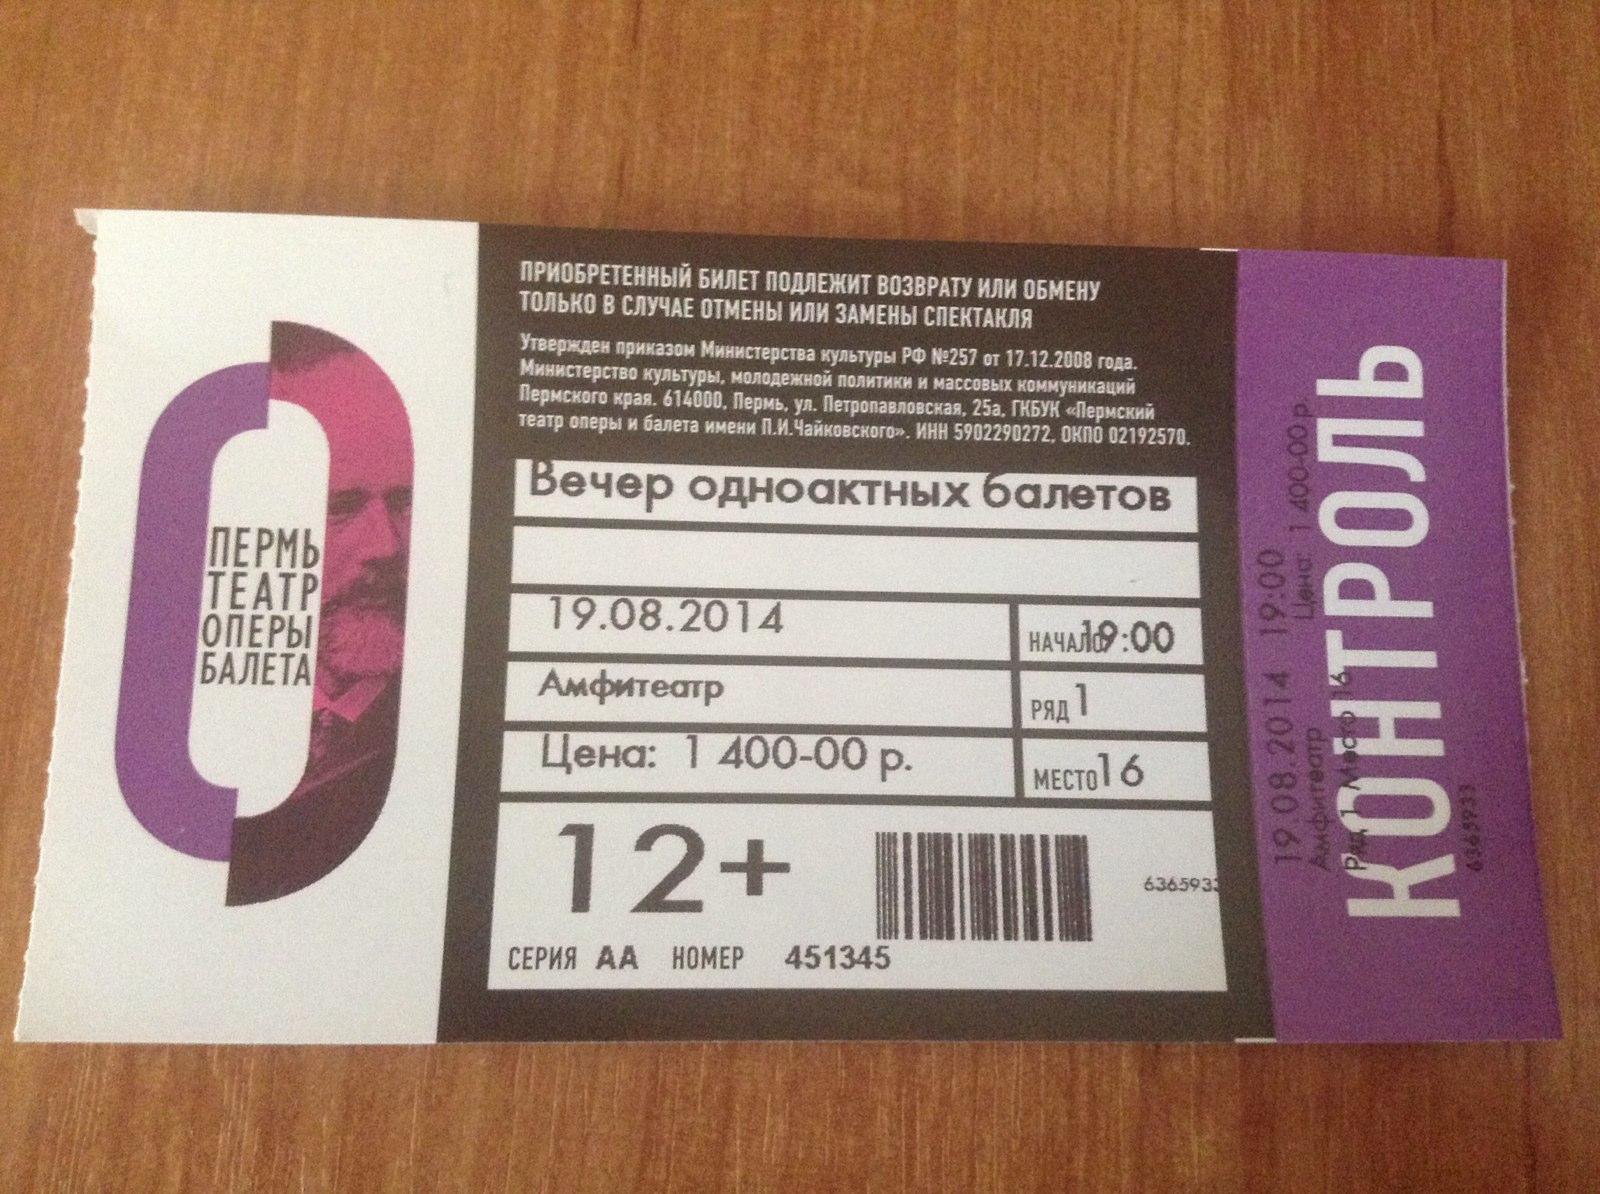 Билеты в театр цирк на концерт шоу в Петербурге на